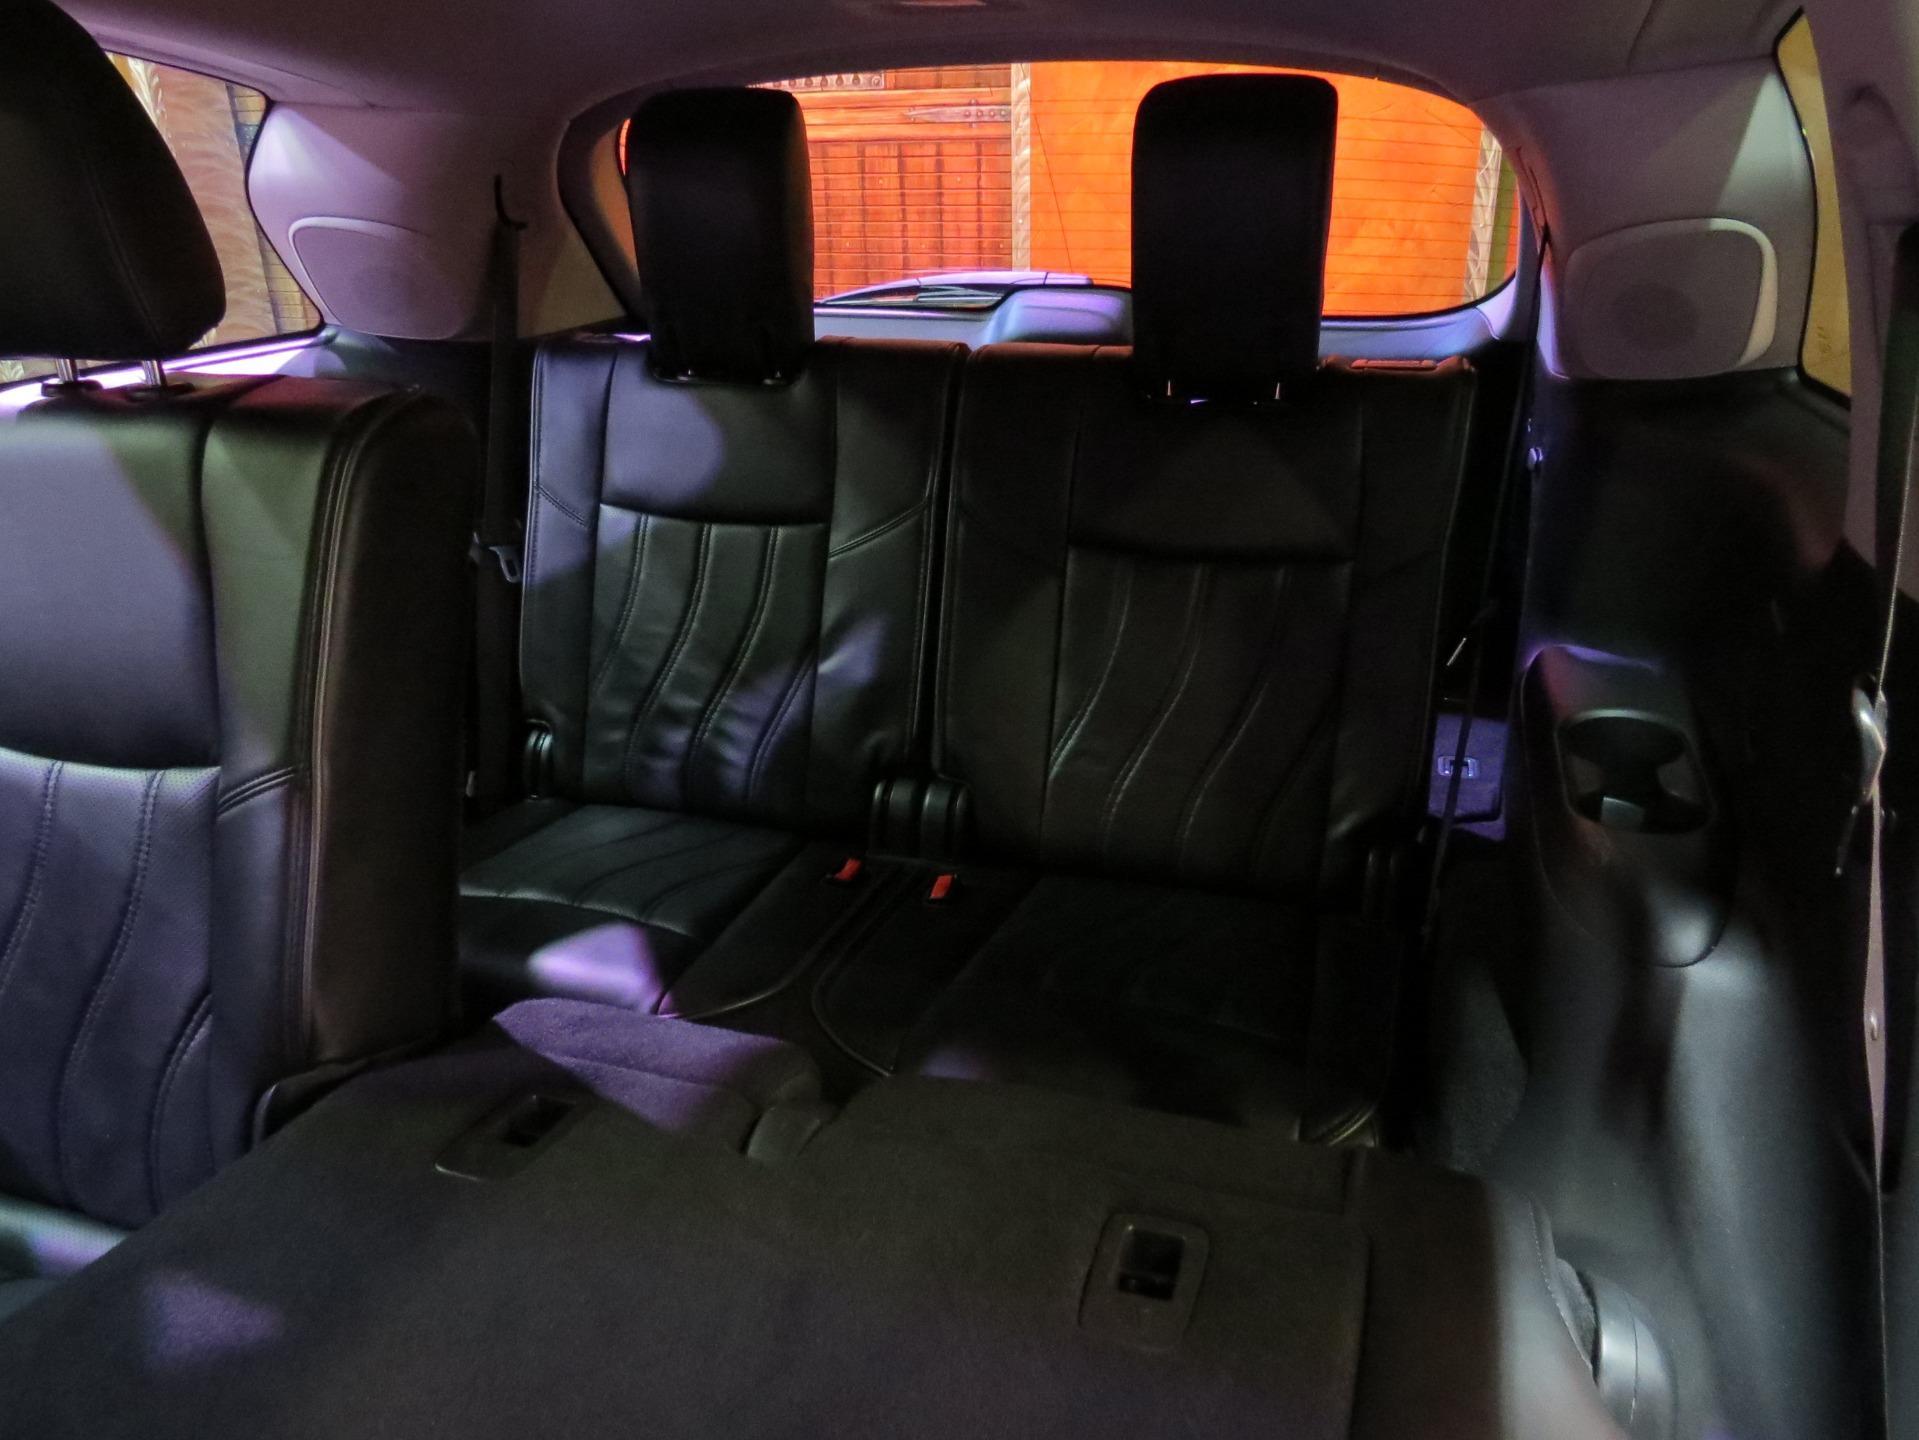 used 2015 INFINITI QX60 car, priced at $28,900